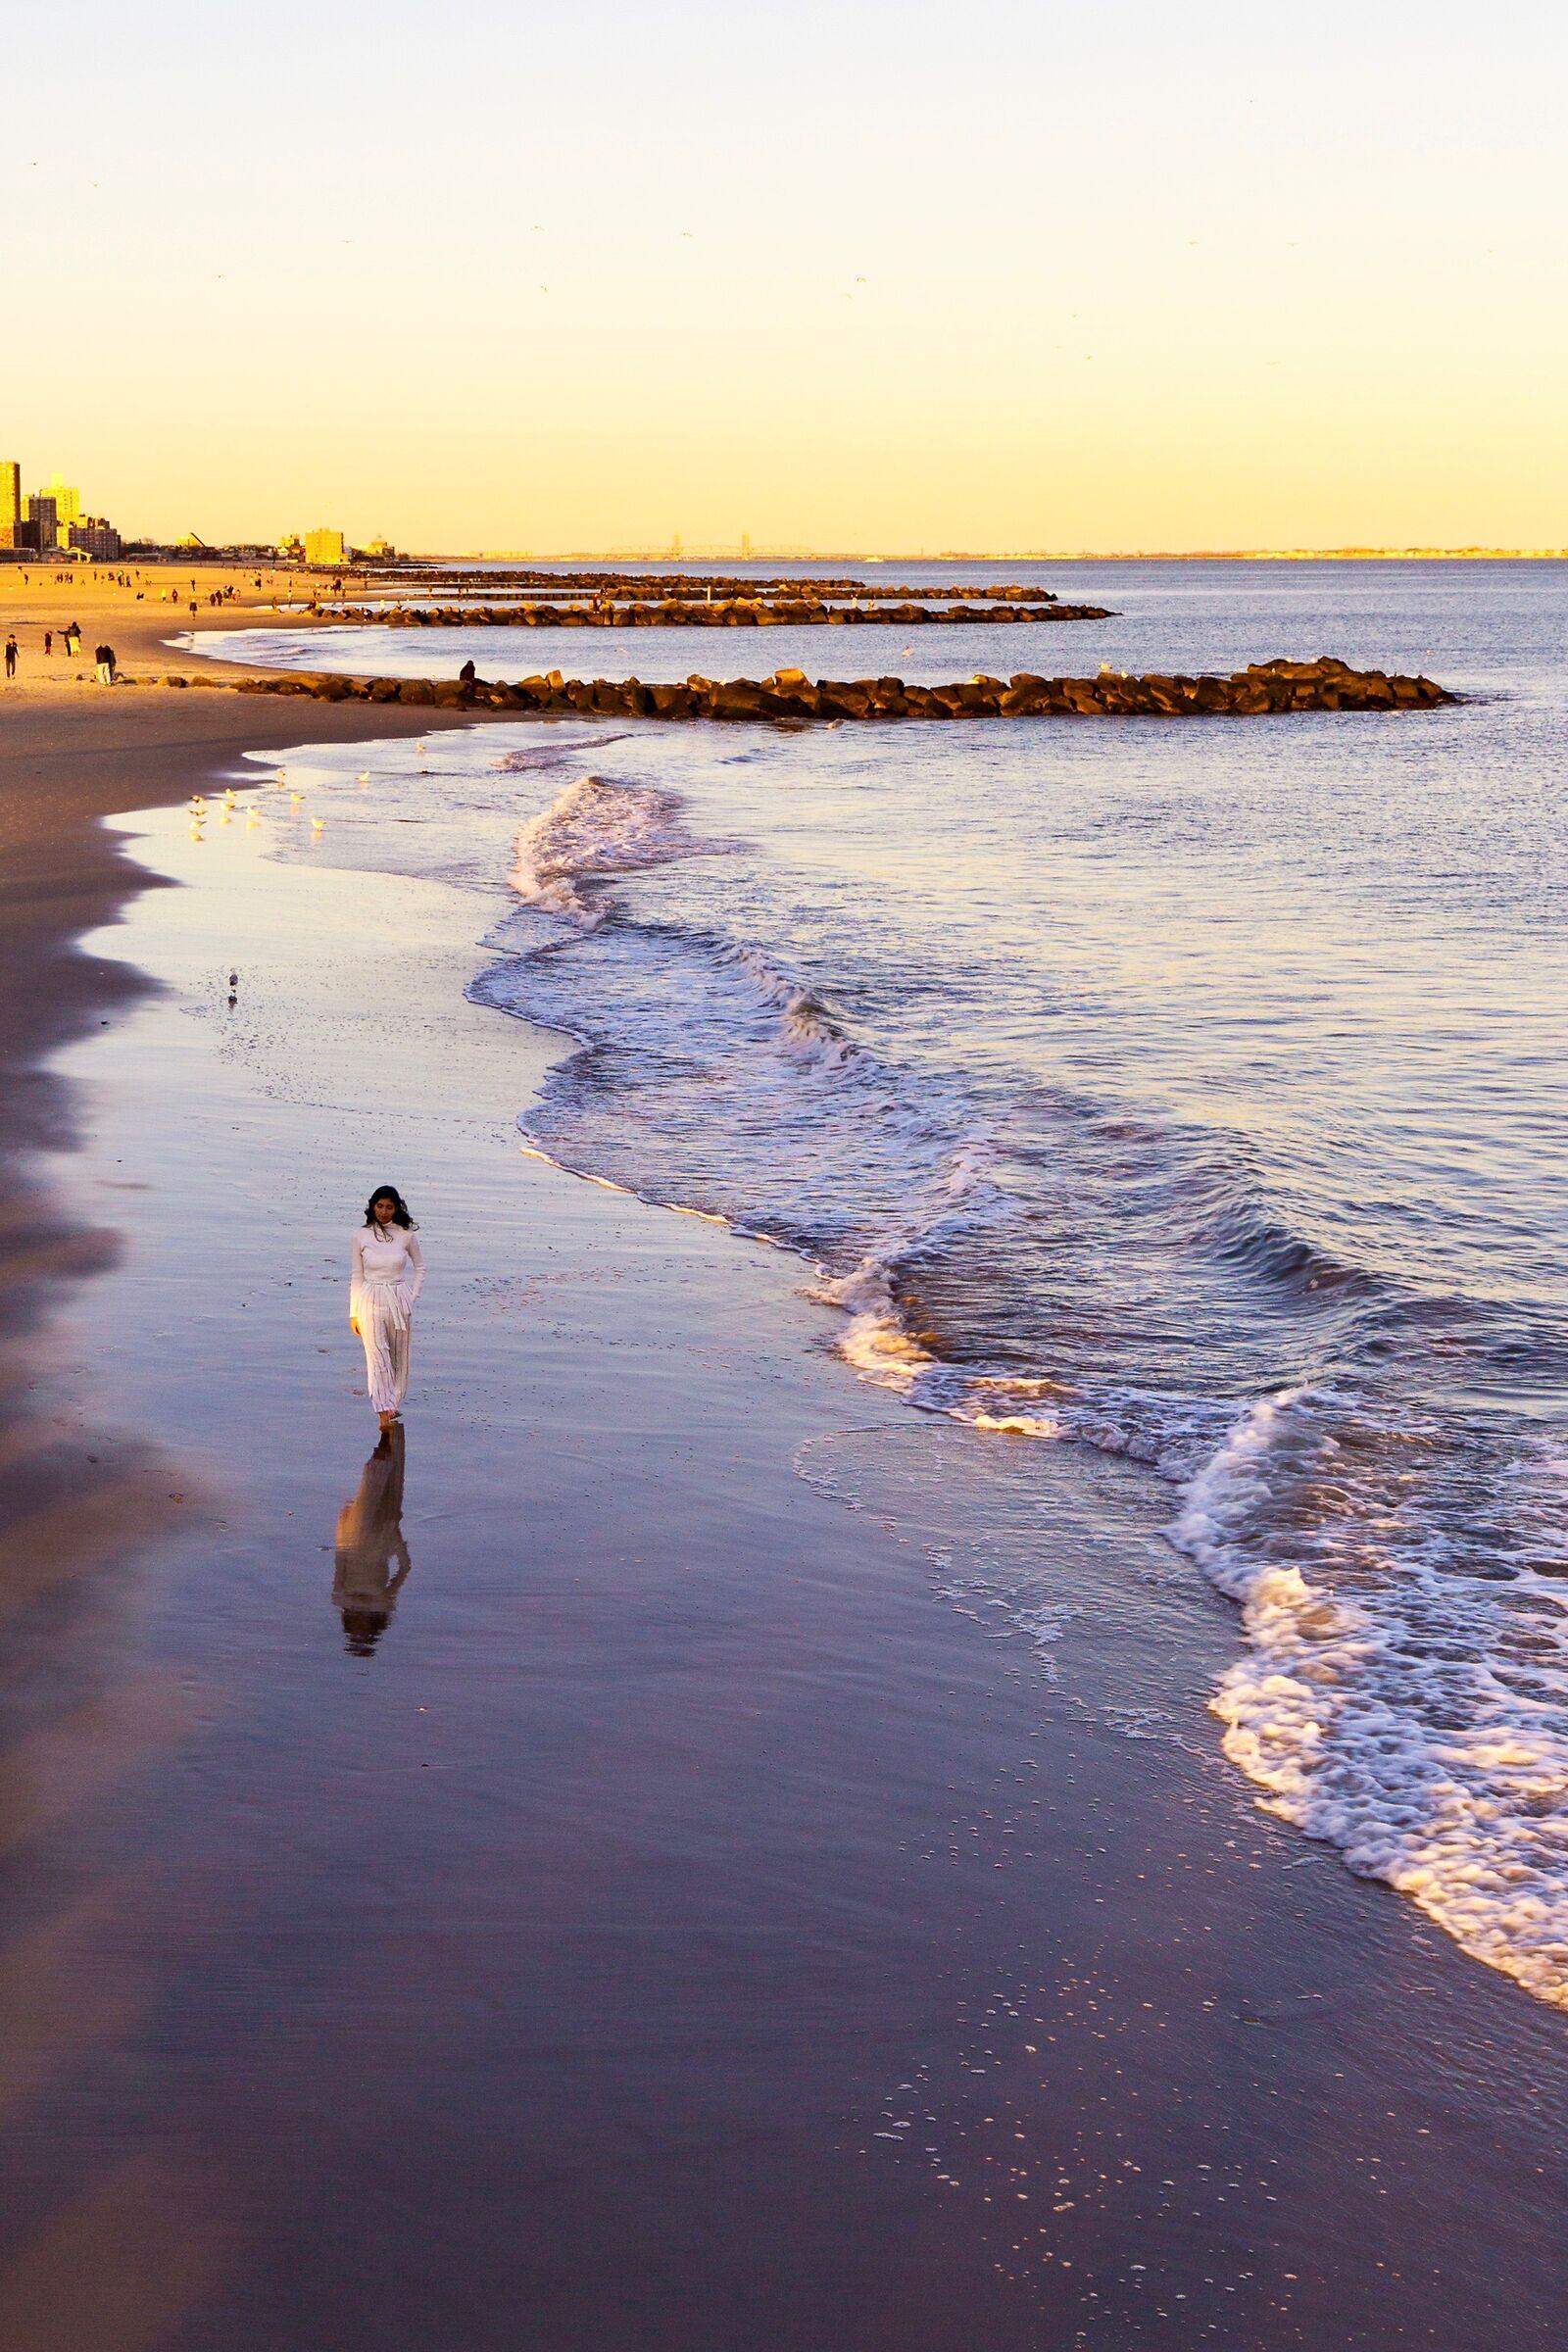 ConeyIsland: due passi a piedi nudi in atlantico...